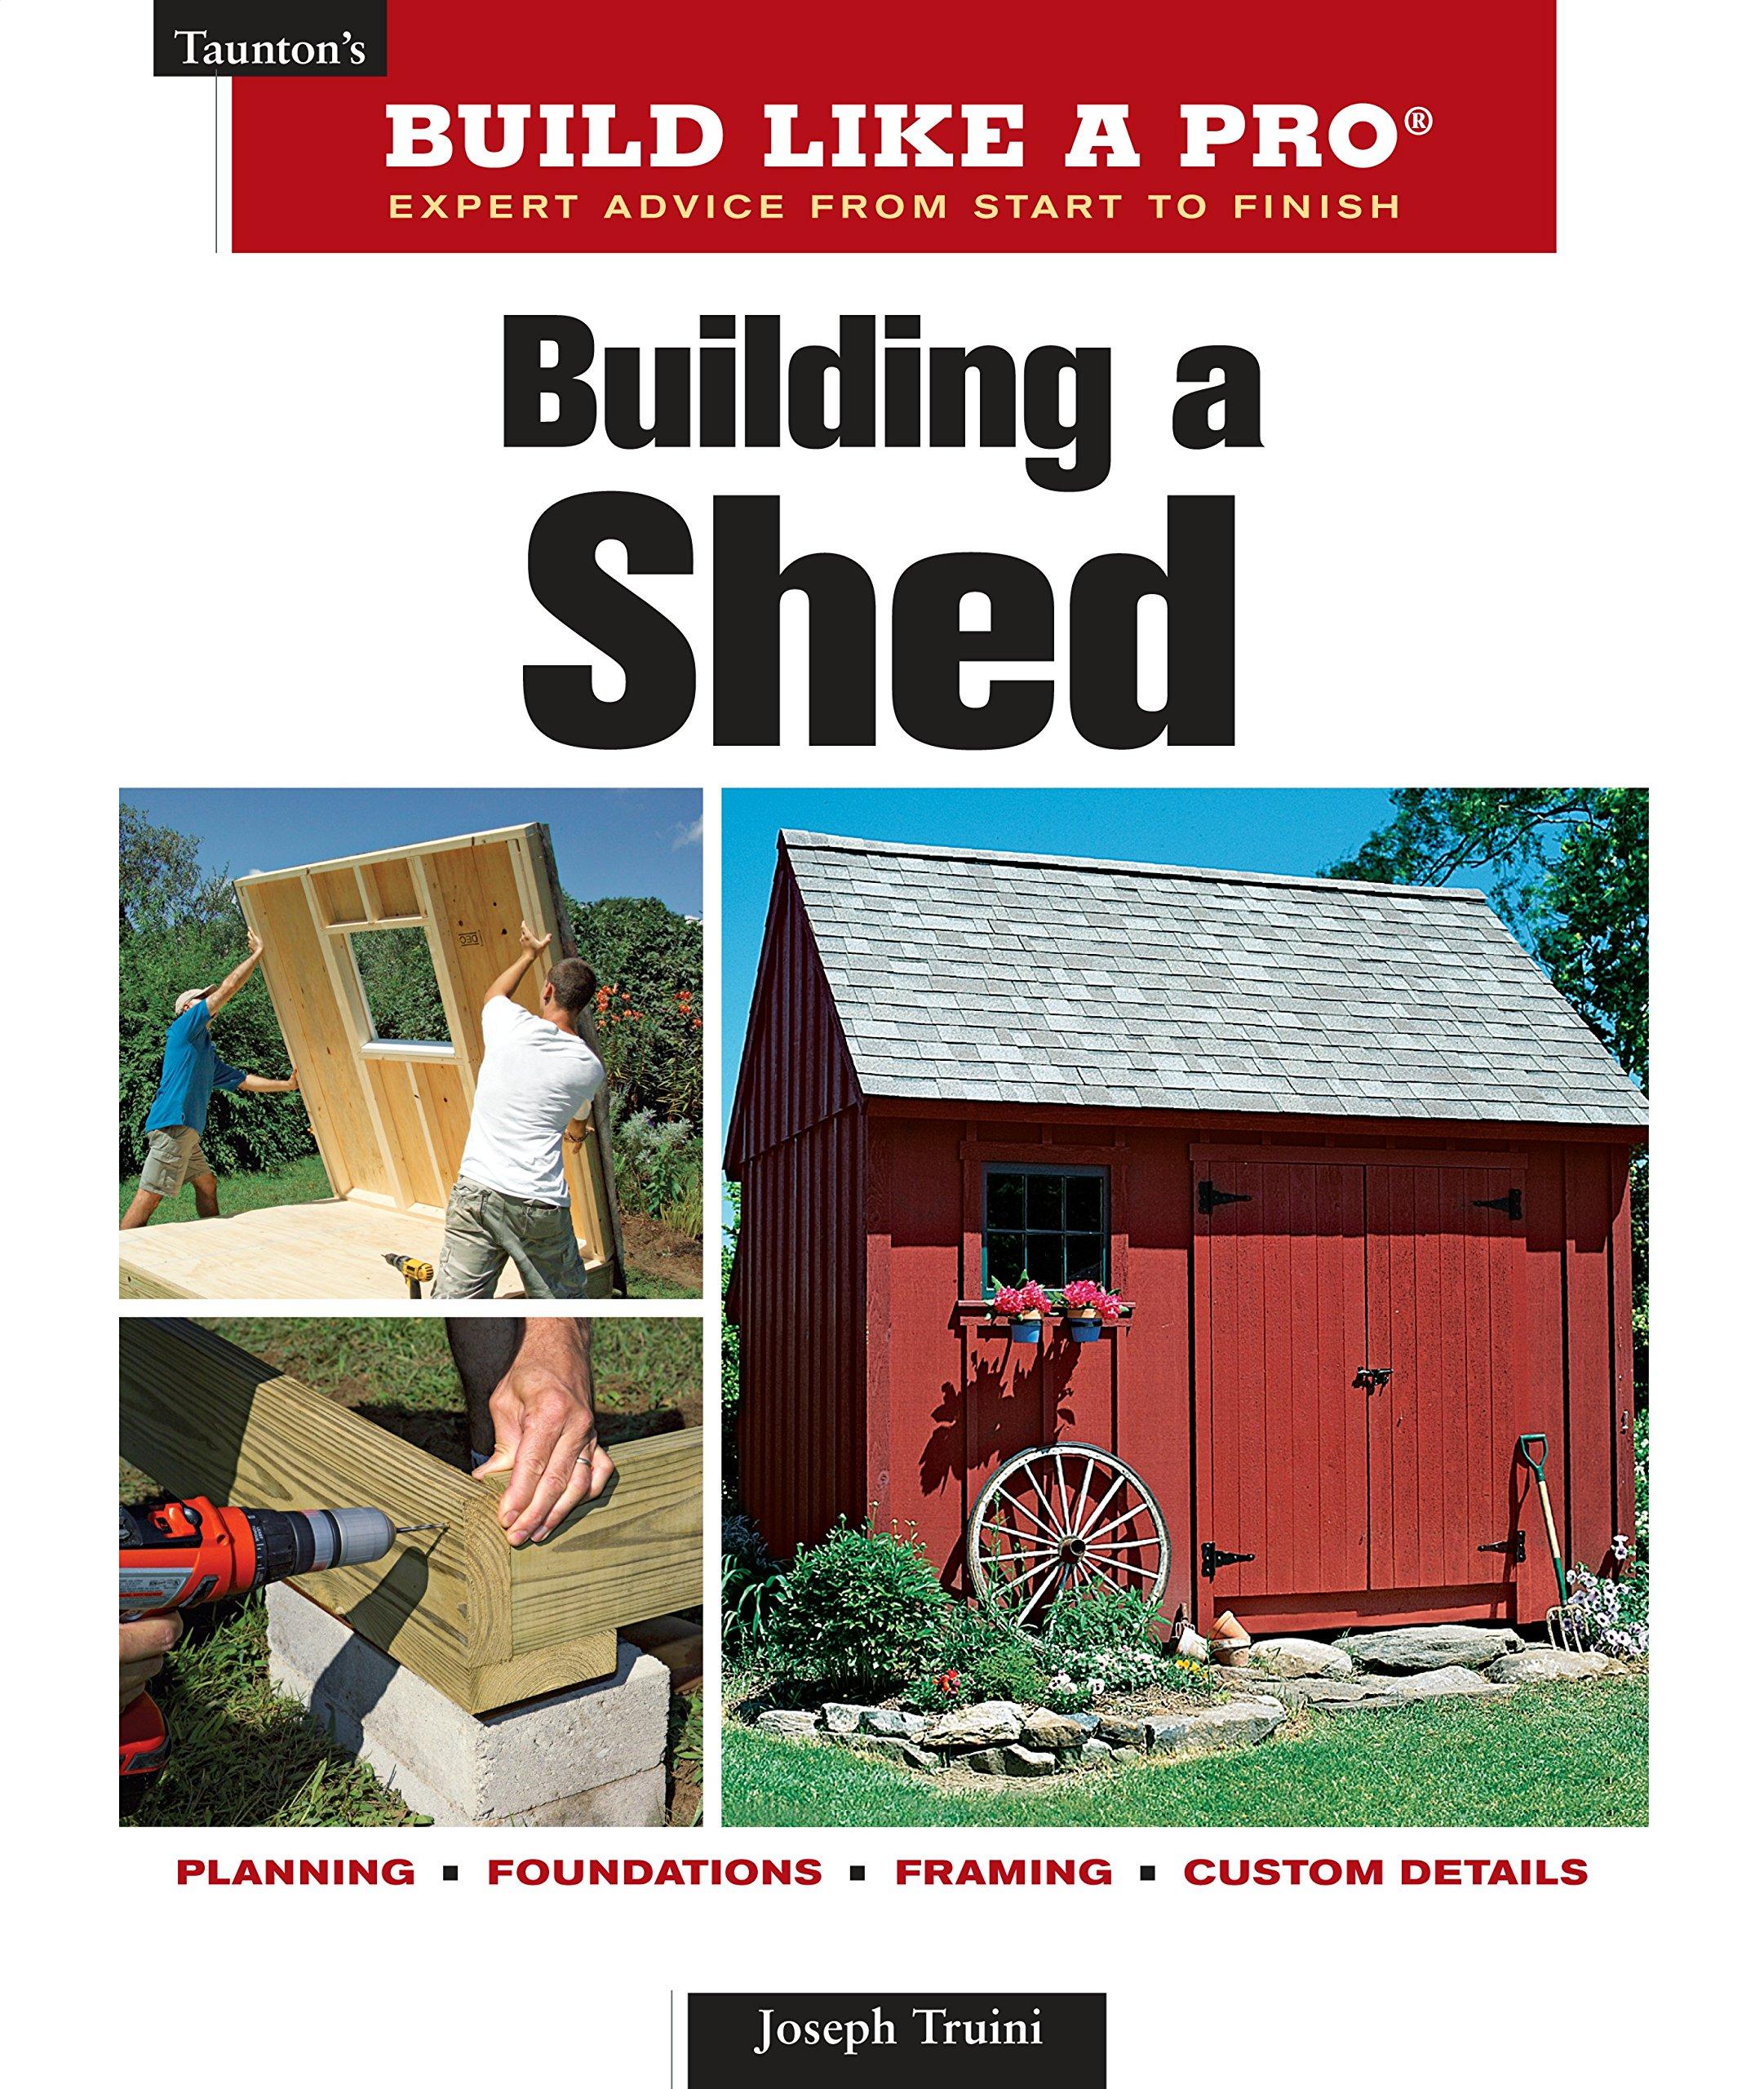 Building A Shed Taunton S Build Like A Pro Truini Joseph 9781561589661 Amazon Com Books